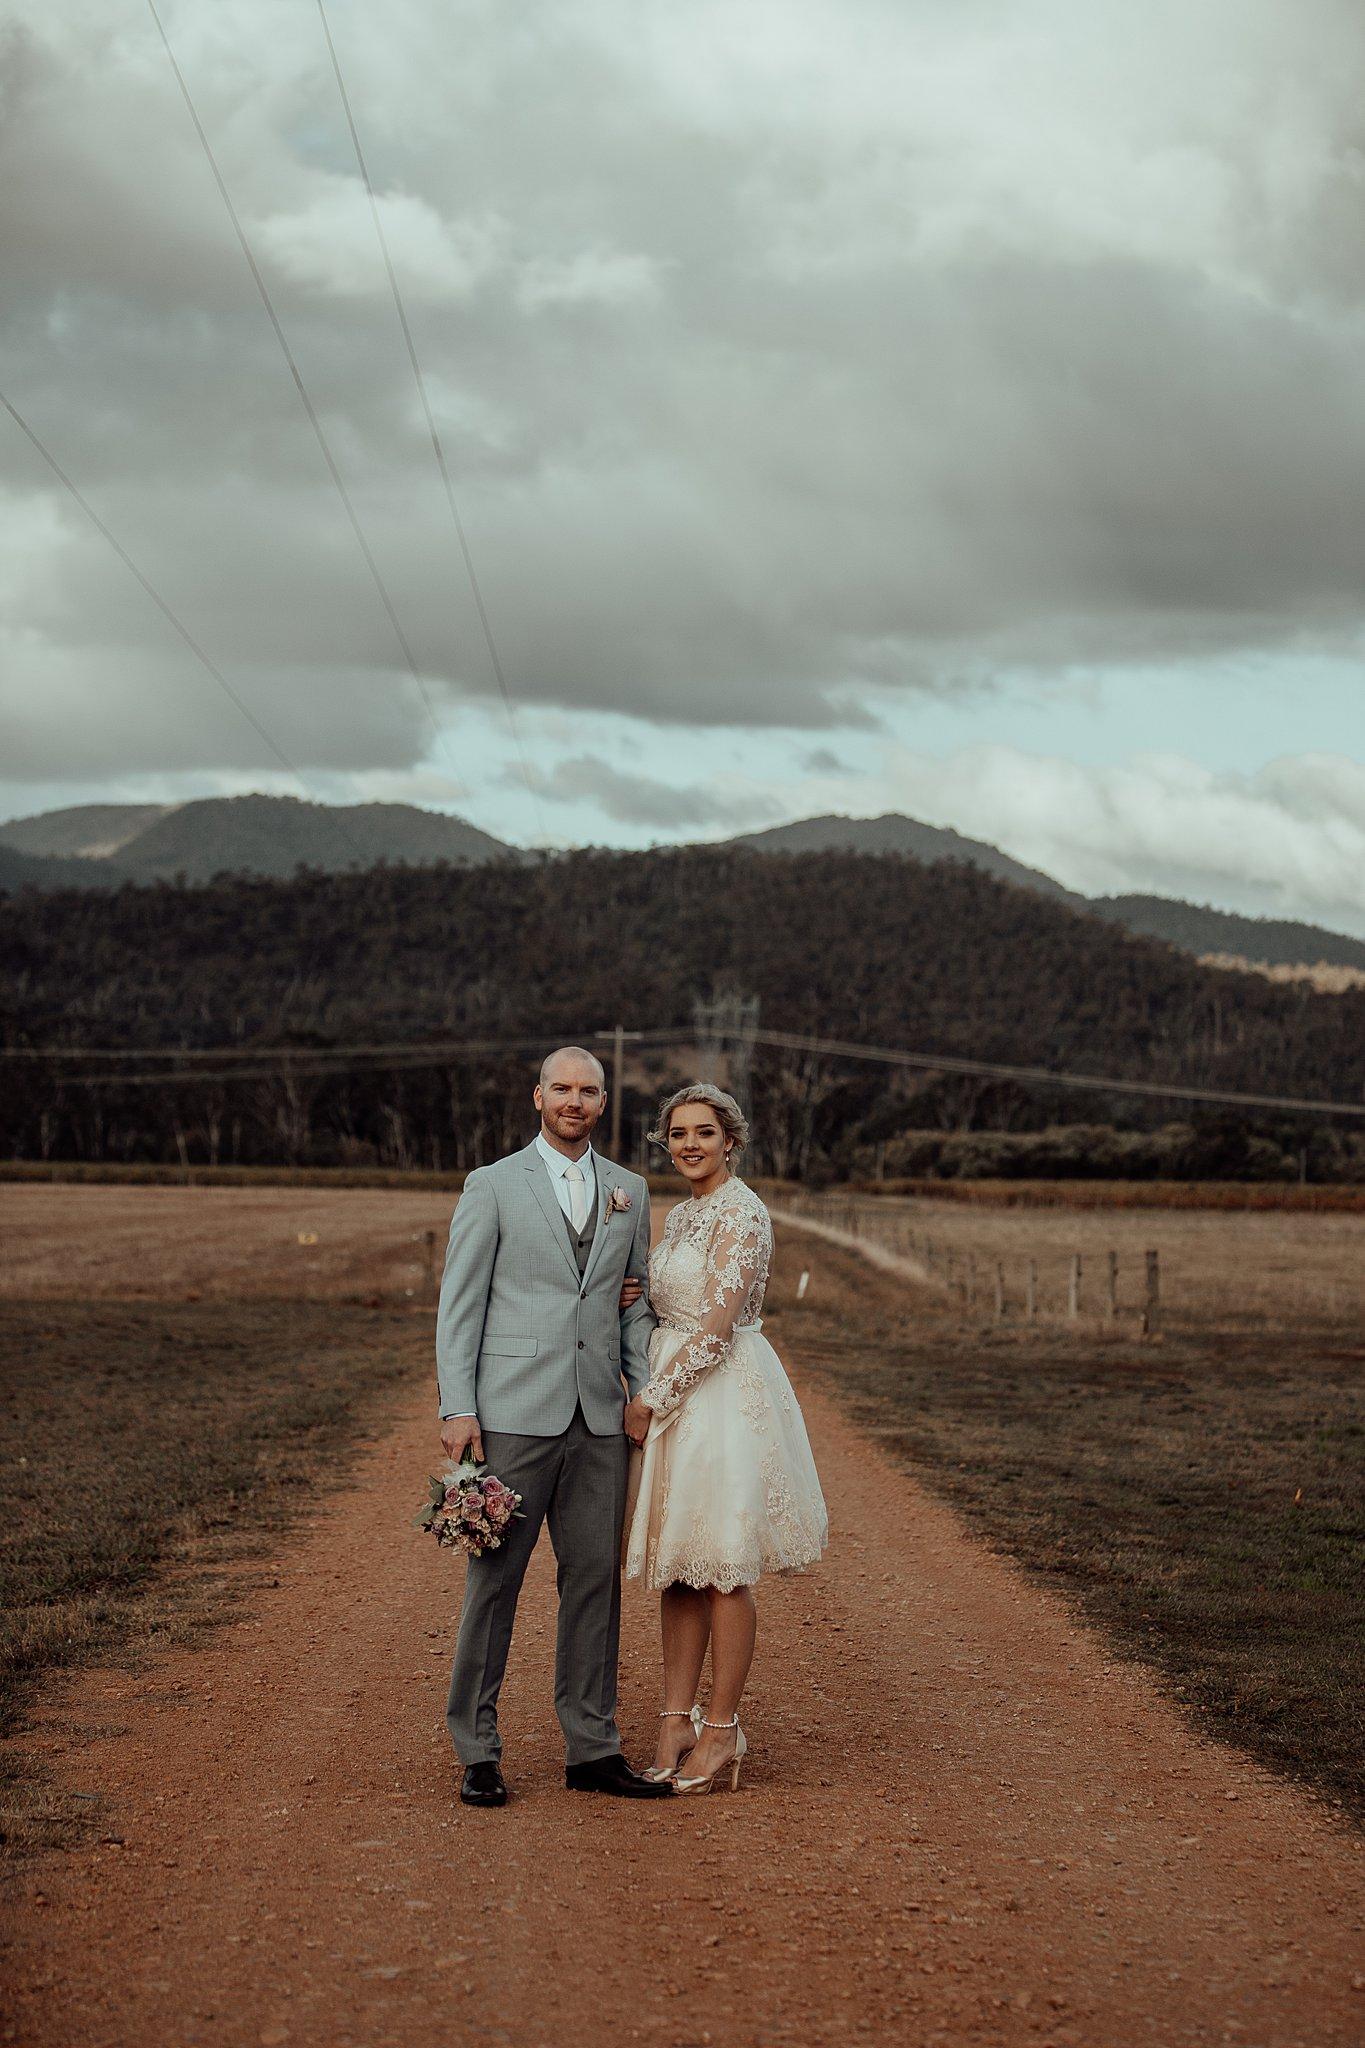 mickalathomas_puremacphotography_weddingphotographer_couplephotographer_Sheppartonphotographer_3460.jpg